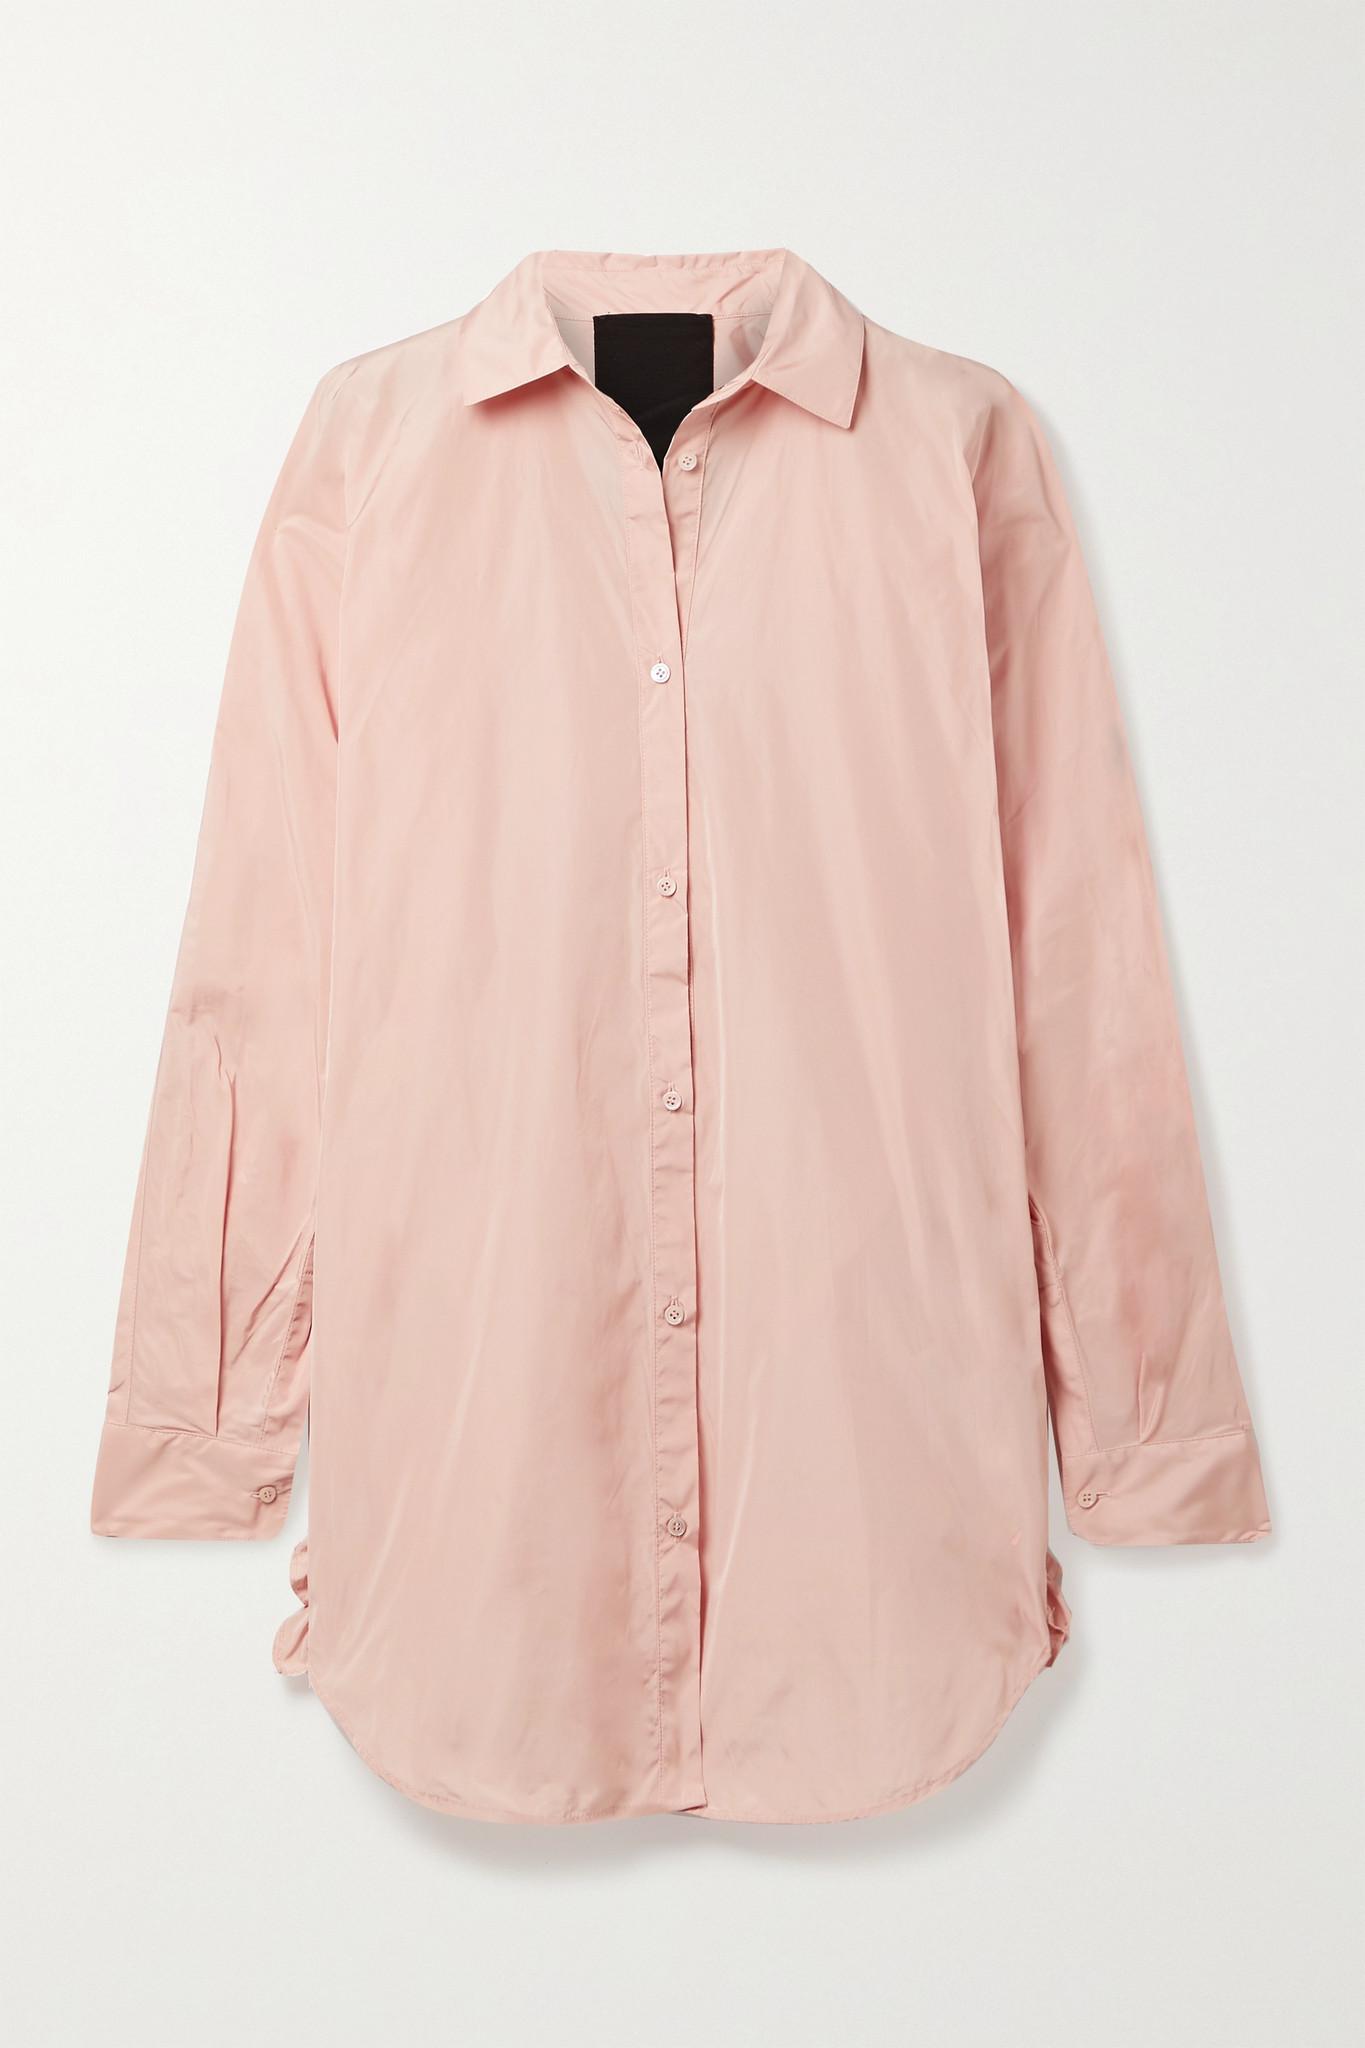 REDVALENTINO - Ruffled Taffeta Shirt - Pink - IT42